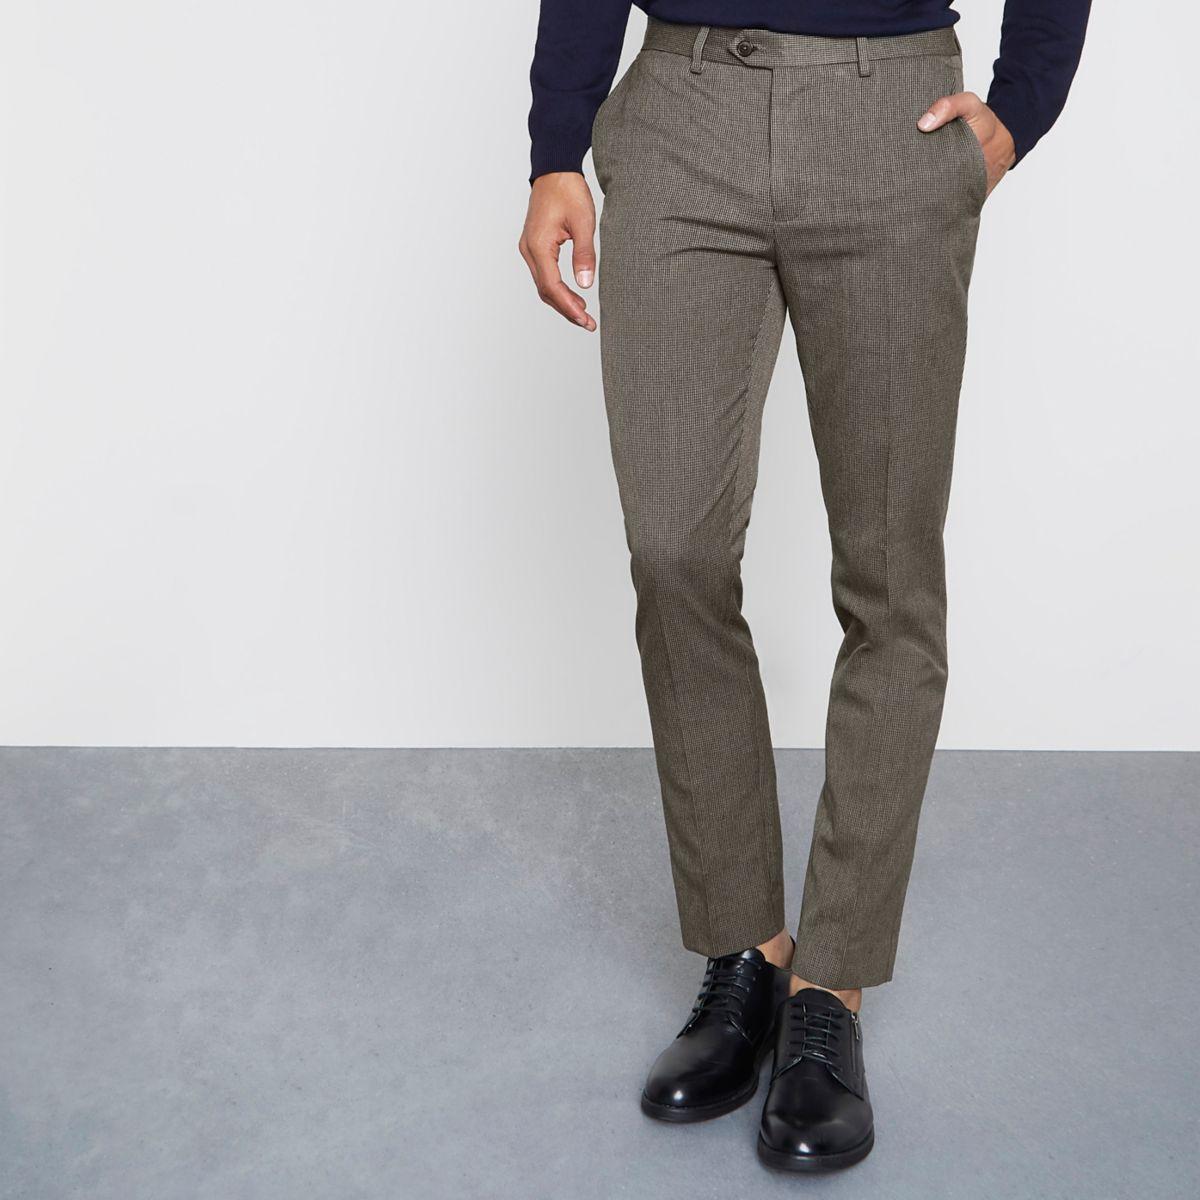 pantalon skinny motif pied de poule marron pantalons. Black Bedroom Furniture Sets. Home Design Ideas